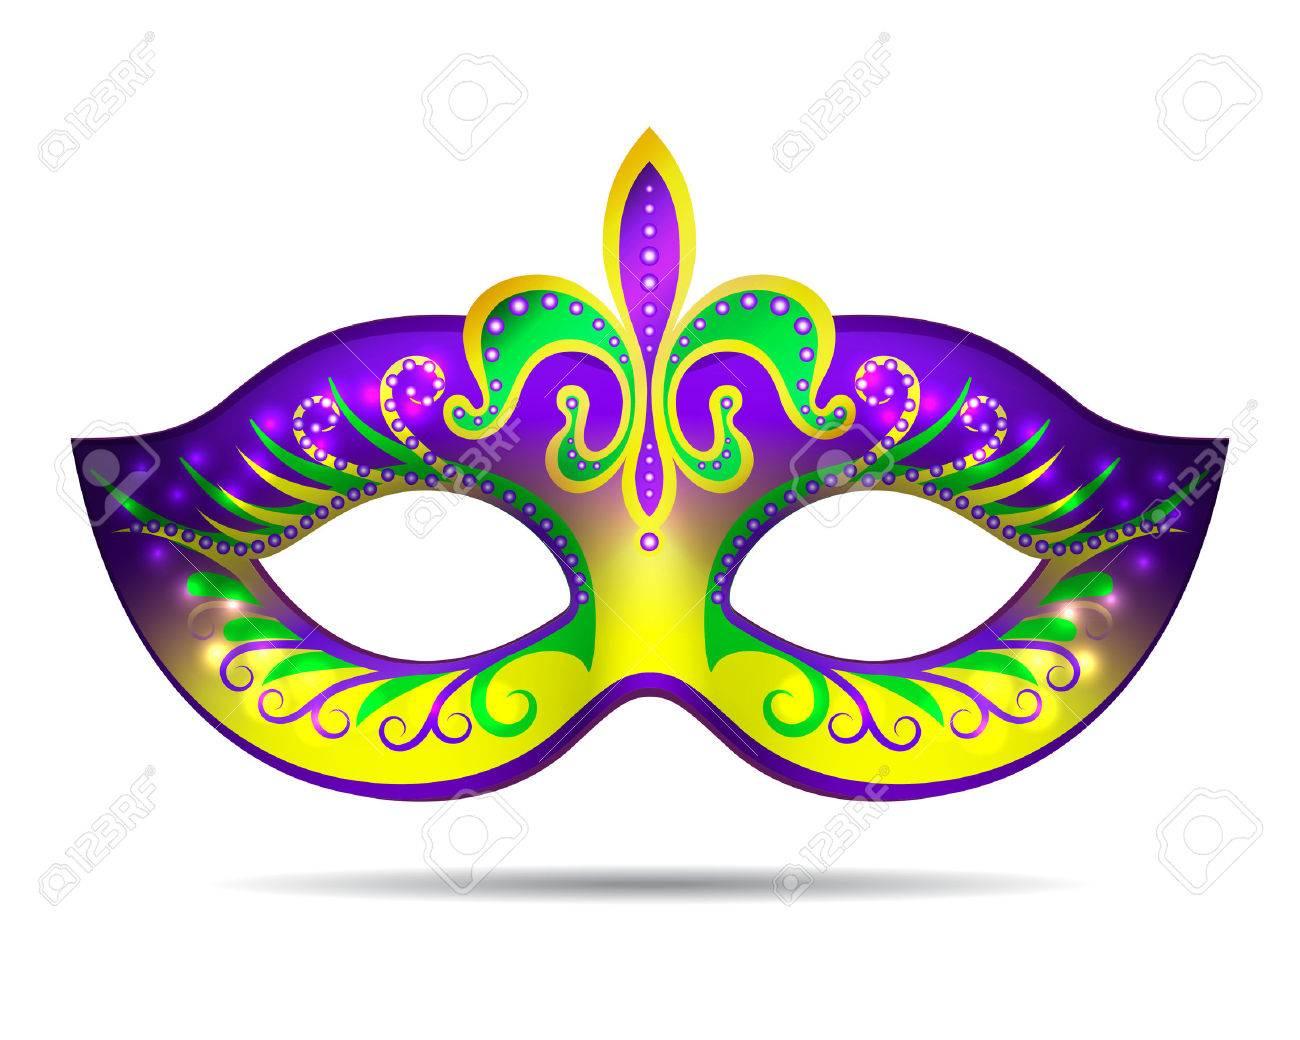 Mardi Gras Masks Pictures Free Download Clip Art.